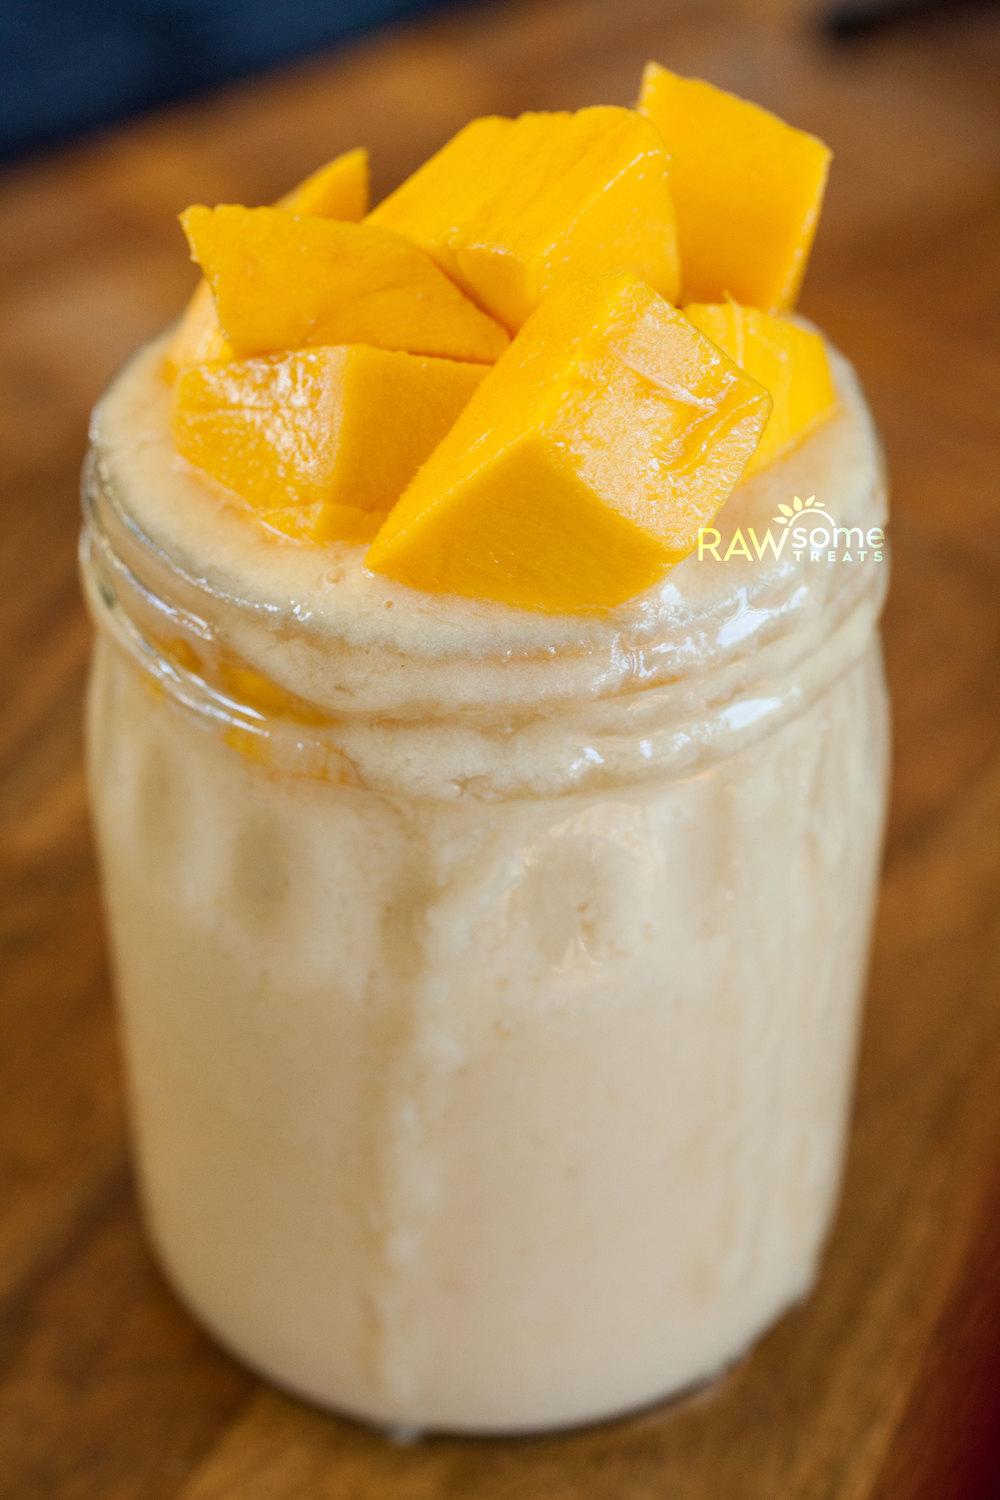 Grapefruit Pineapple Slush